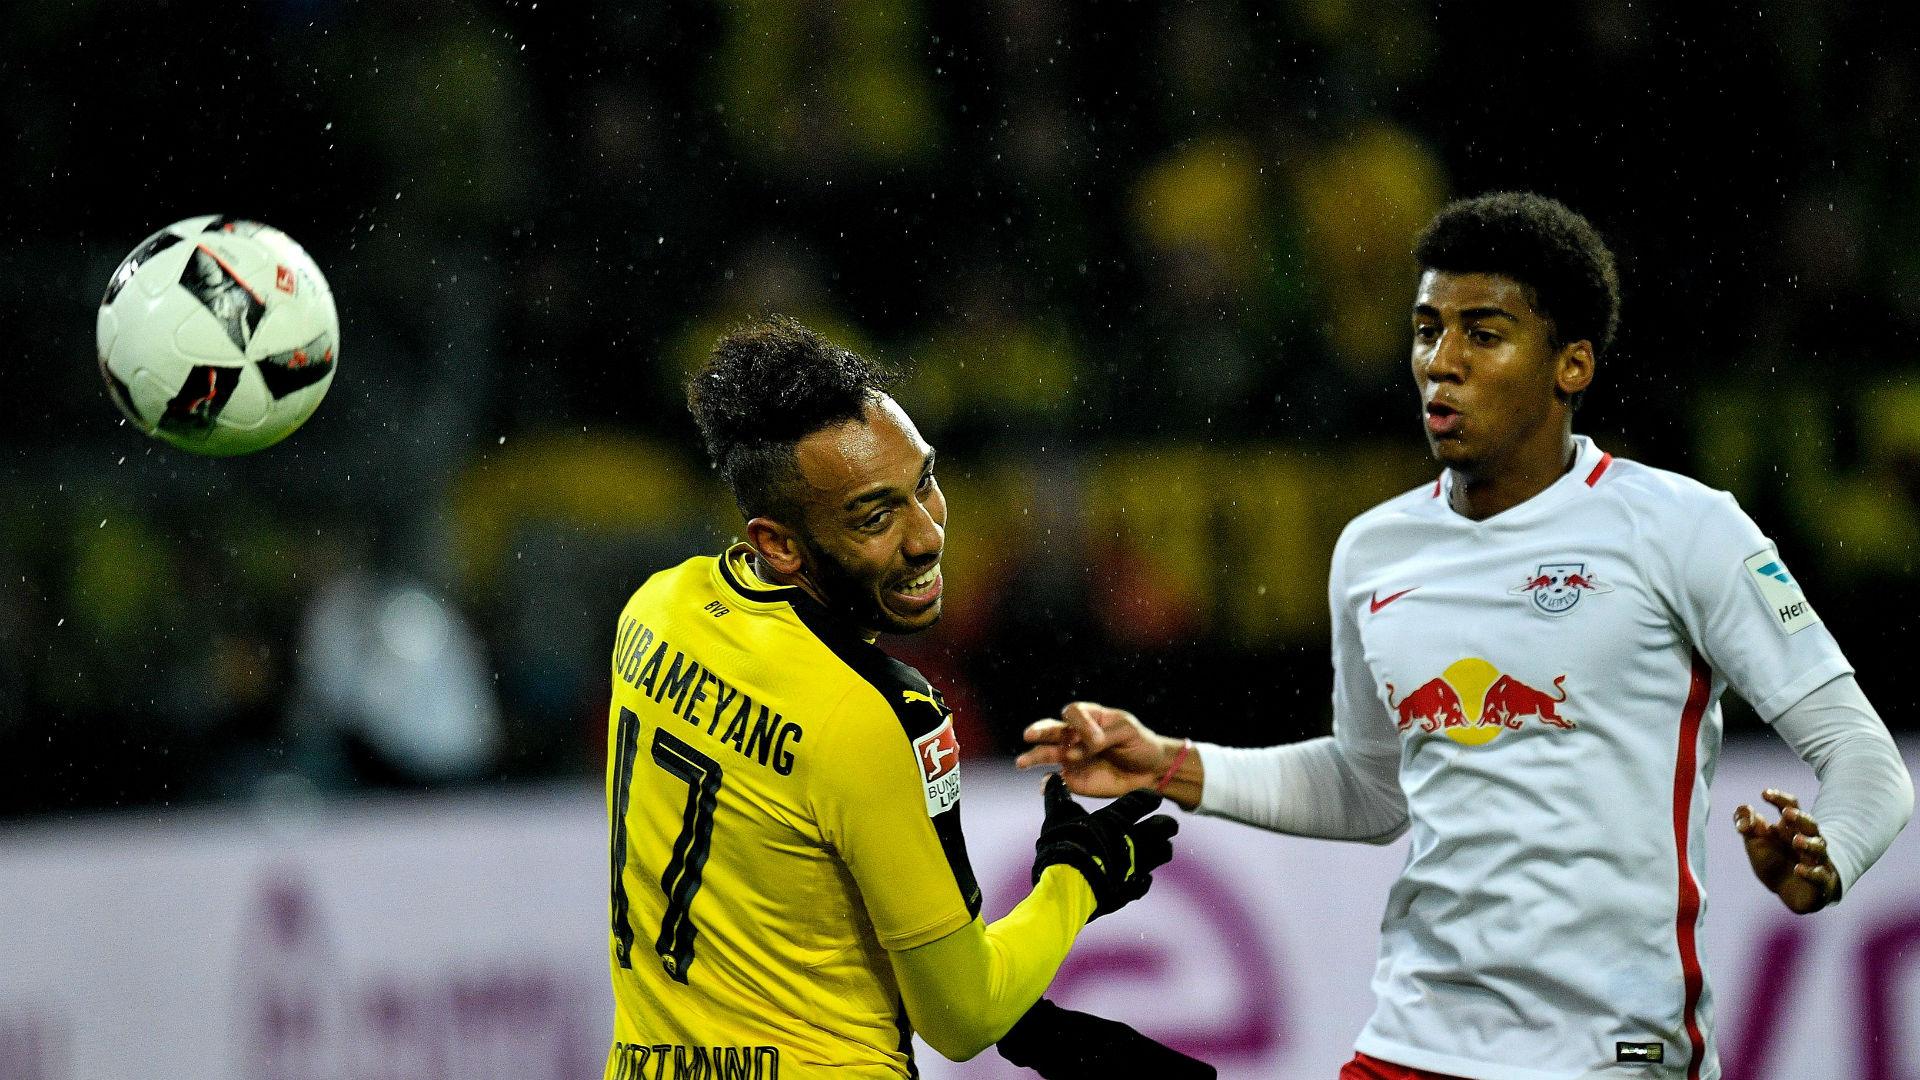 Bernardo Aubameyang RB Leipzig Dortmund Bundesliga 06 04 2017